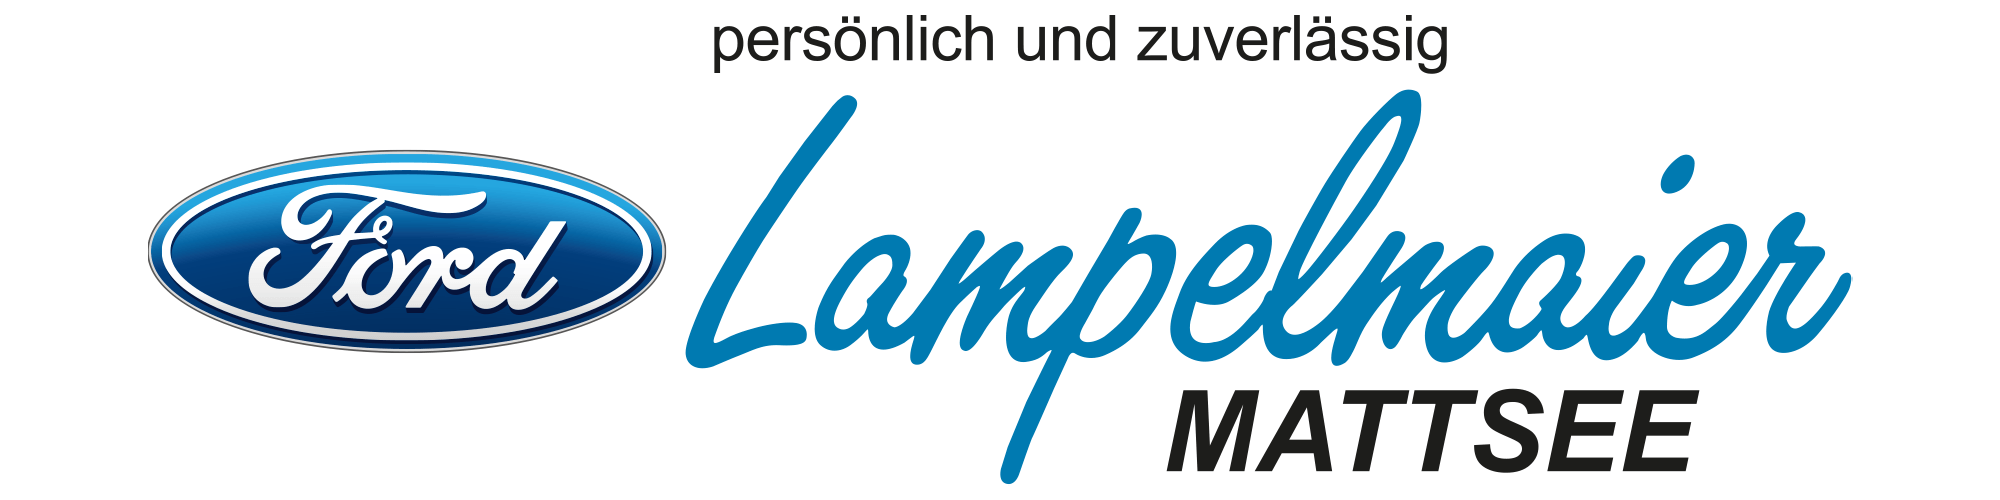 Ford Lampelmaier in Mattsee - Logo